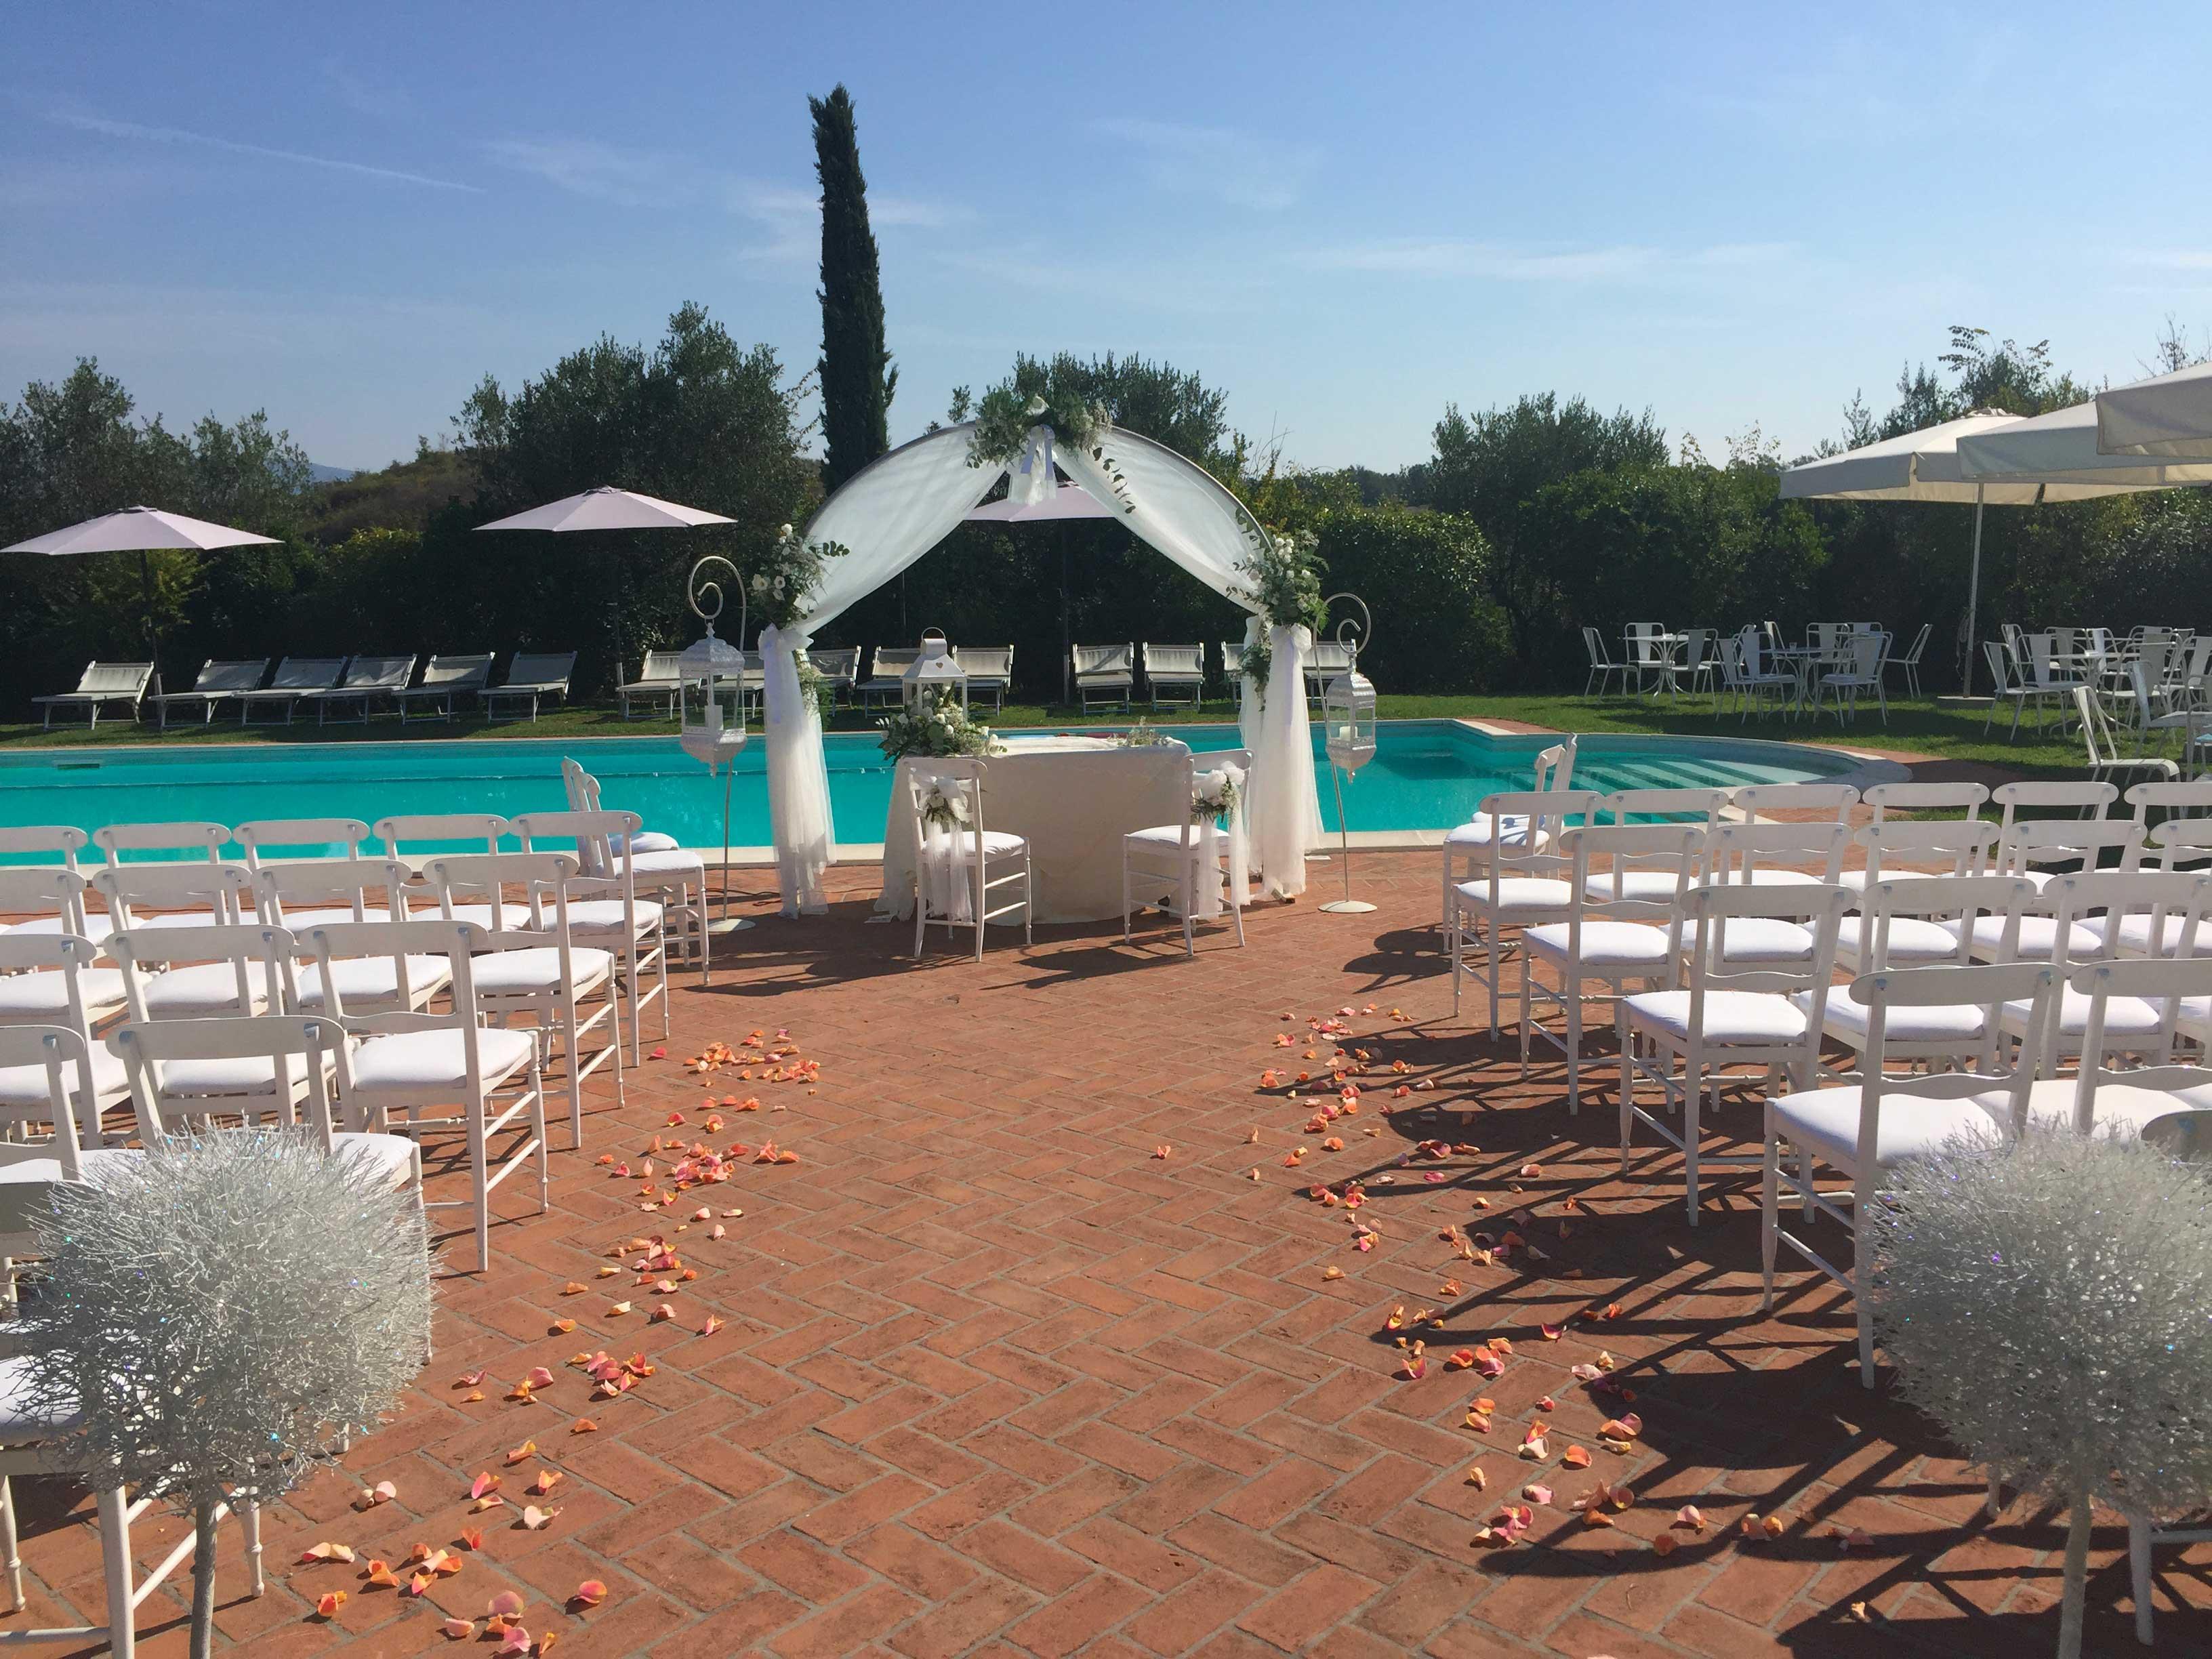 Ristoranti Matrimonio Toscana : Location matrimoni firenze location matrimoni chianti toscana